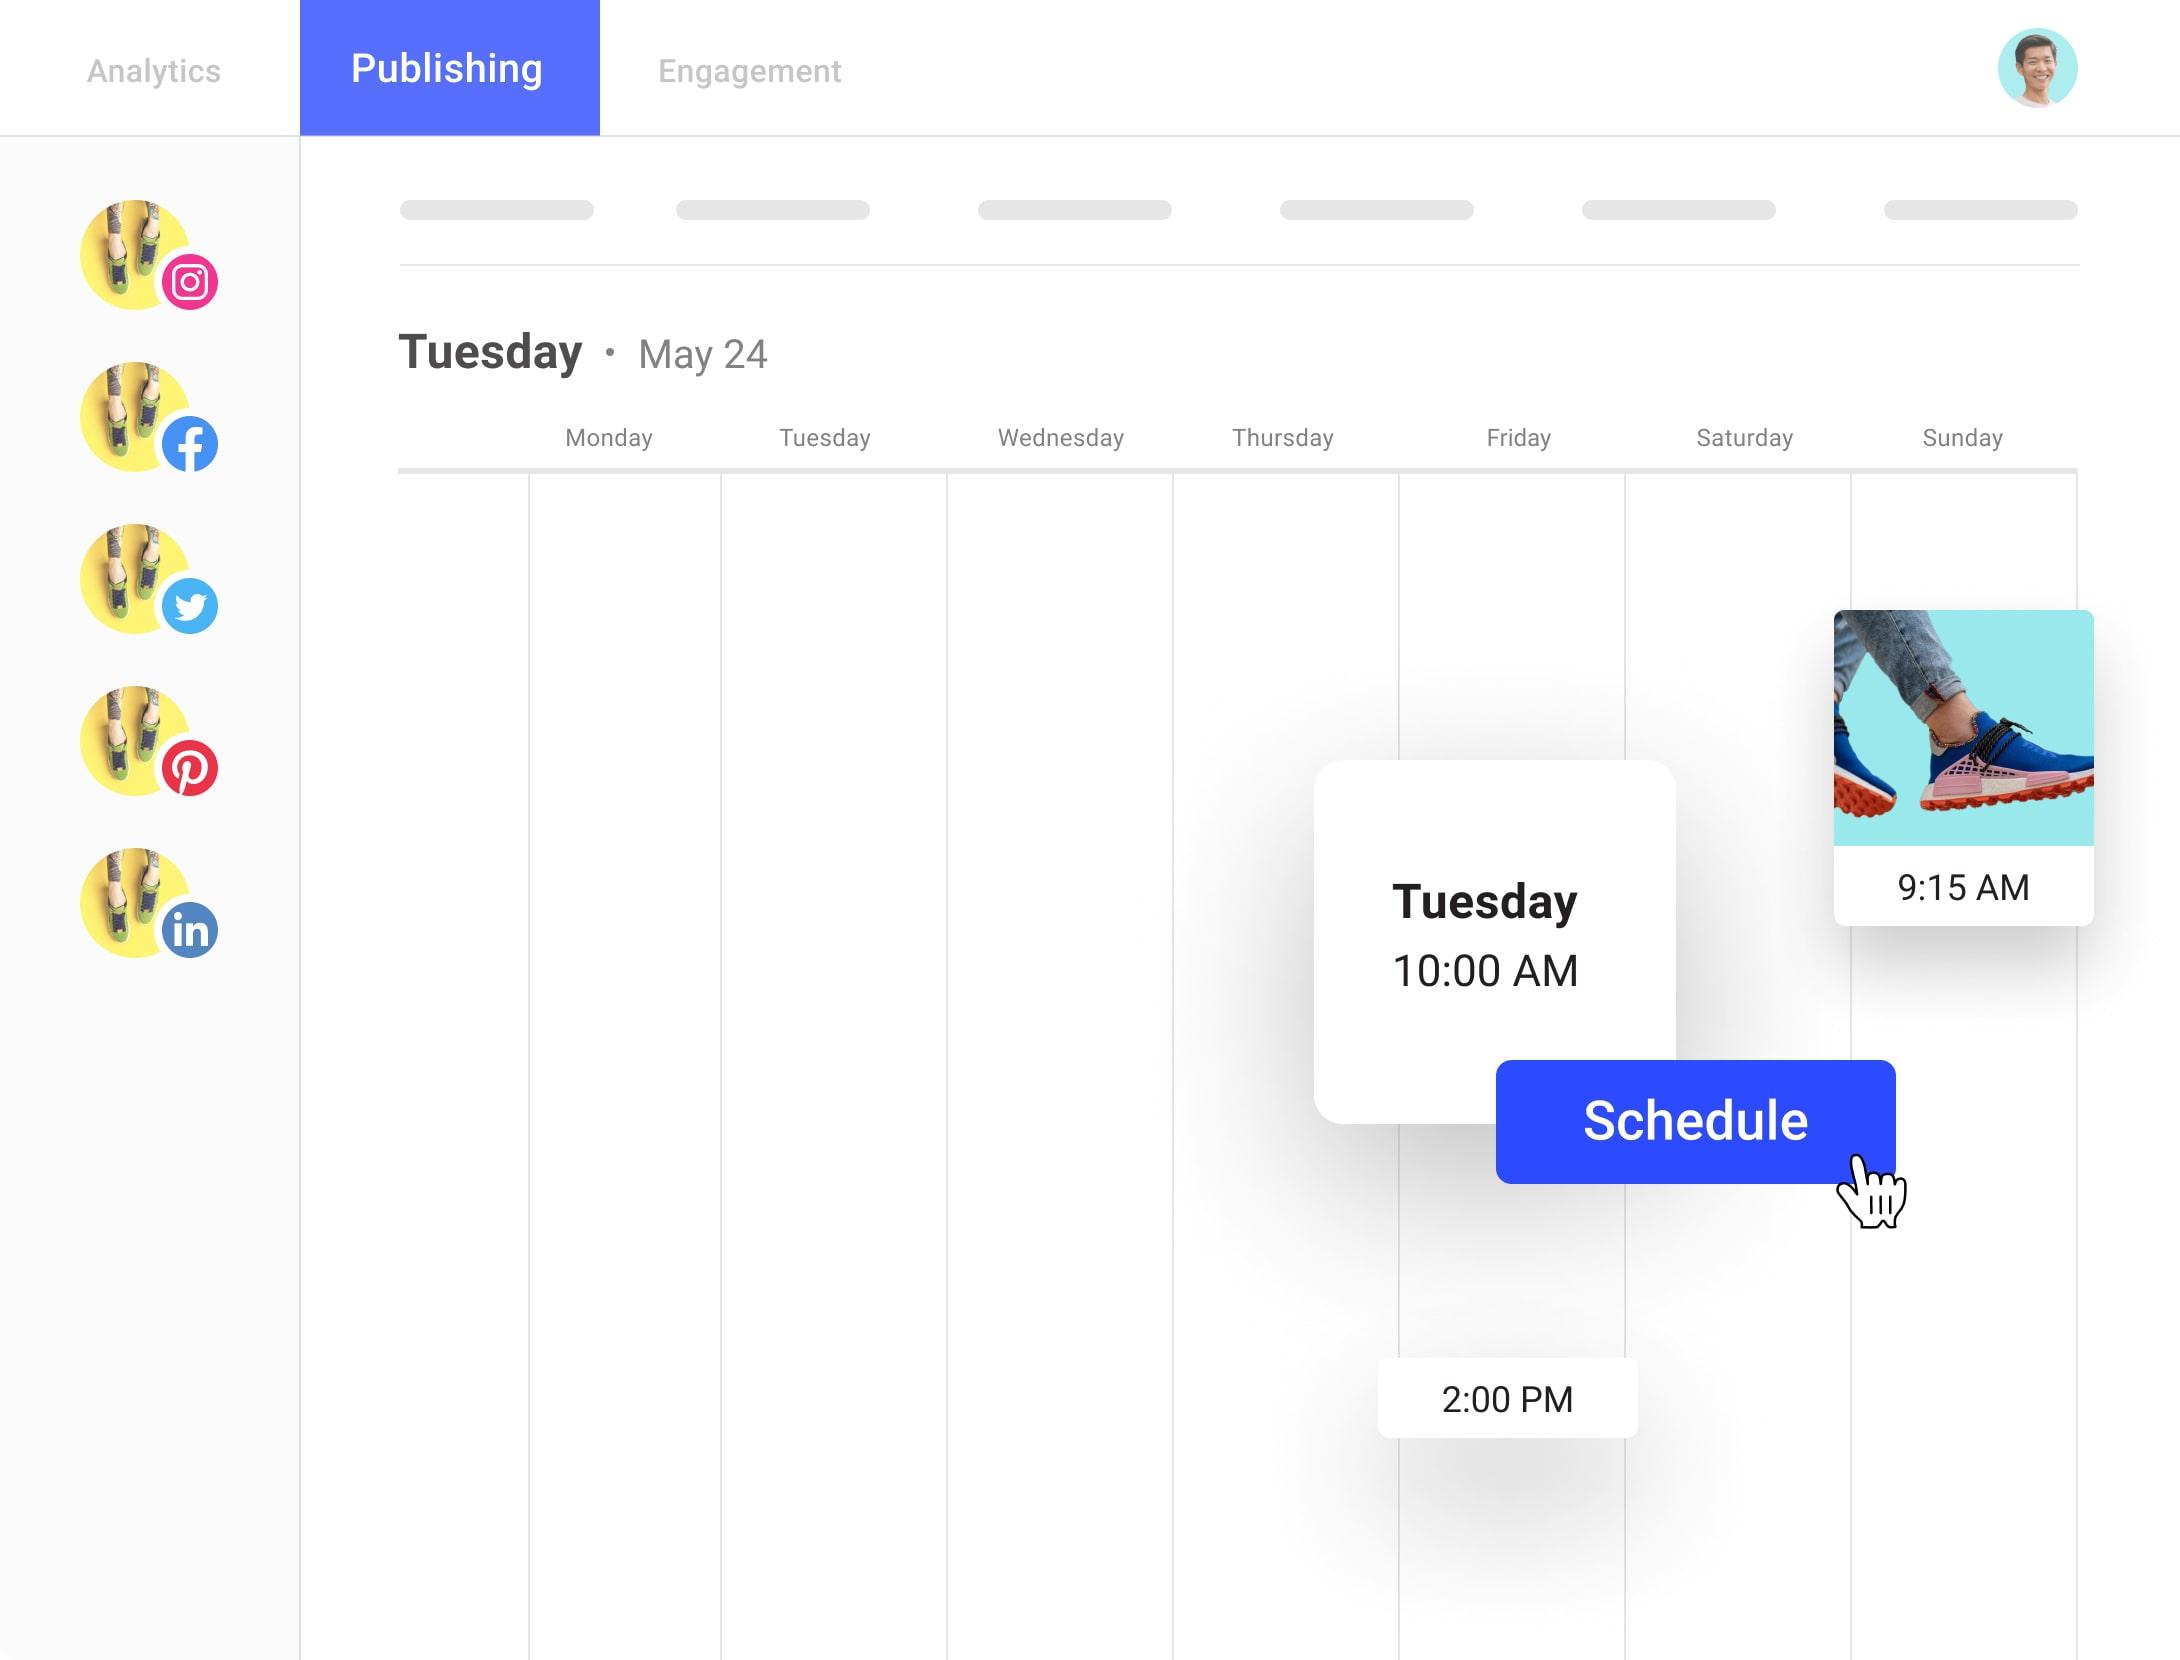 Illustration of Buffer's social media planning and publishing tool